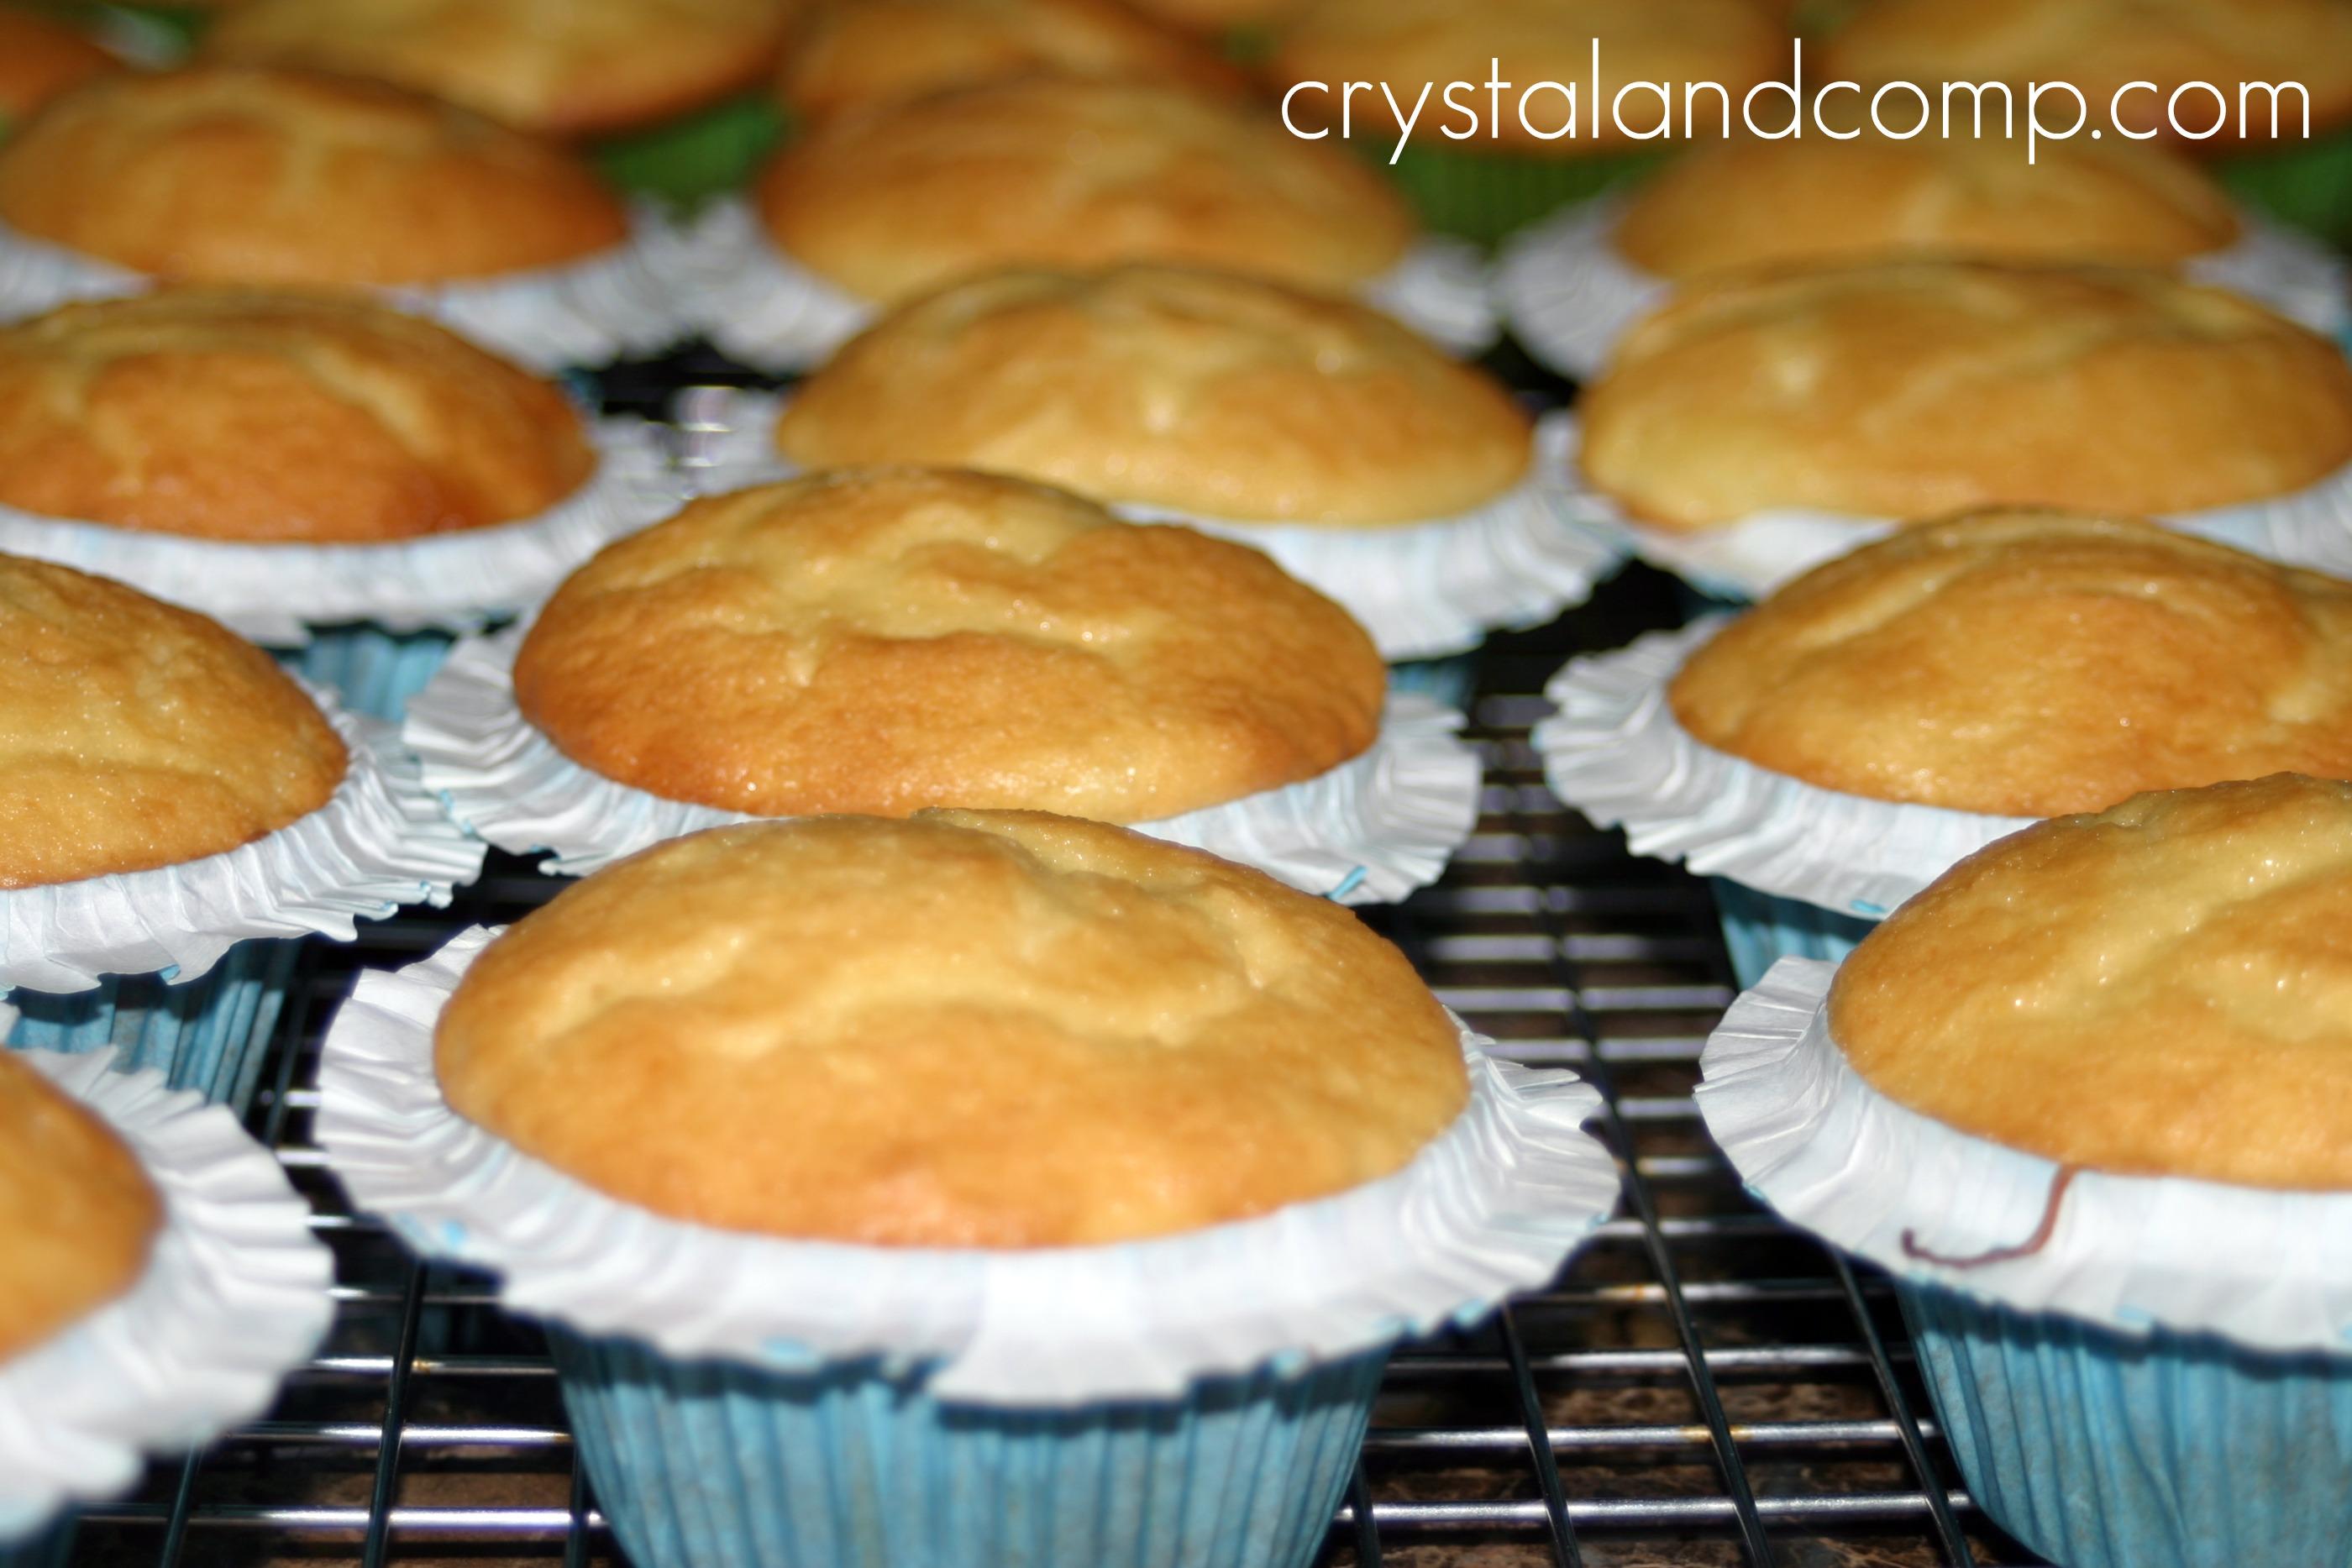 This recipe makes 24 standard size cupcakes. & Homemade Cupcake Recipe Aboutintivar.Com